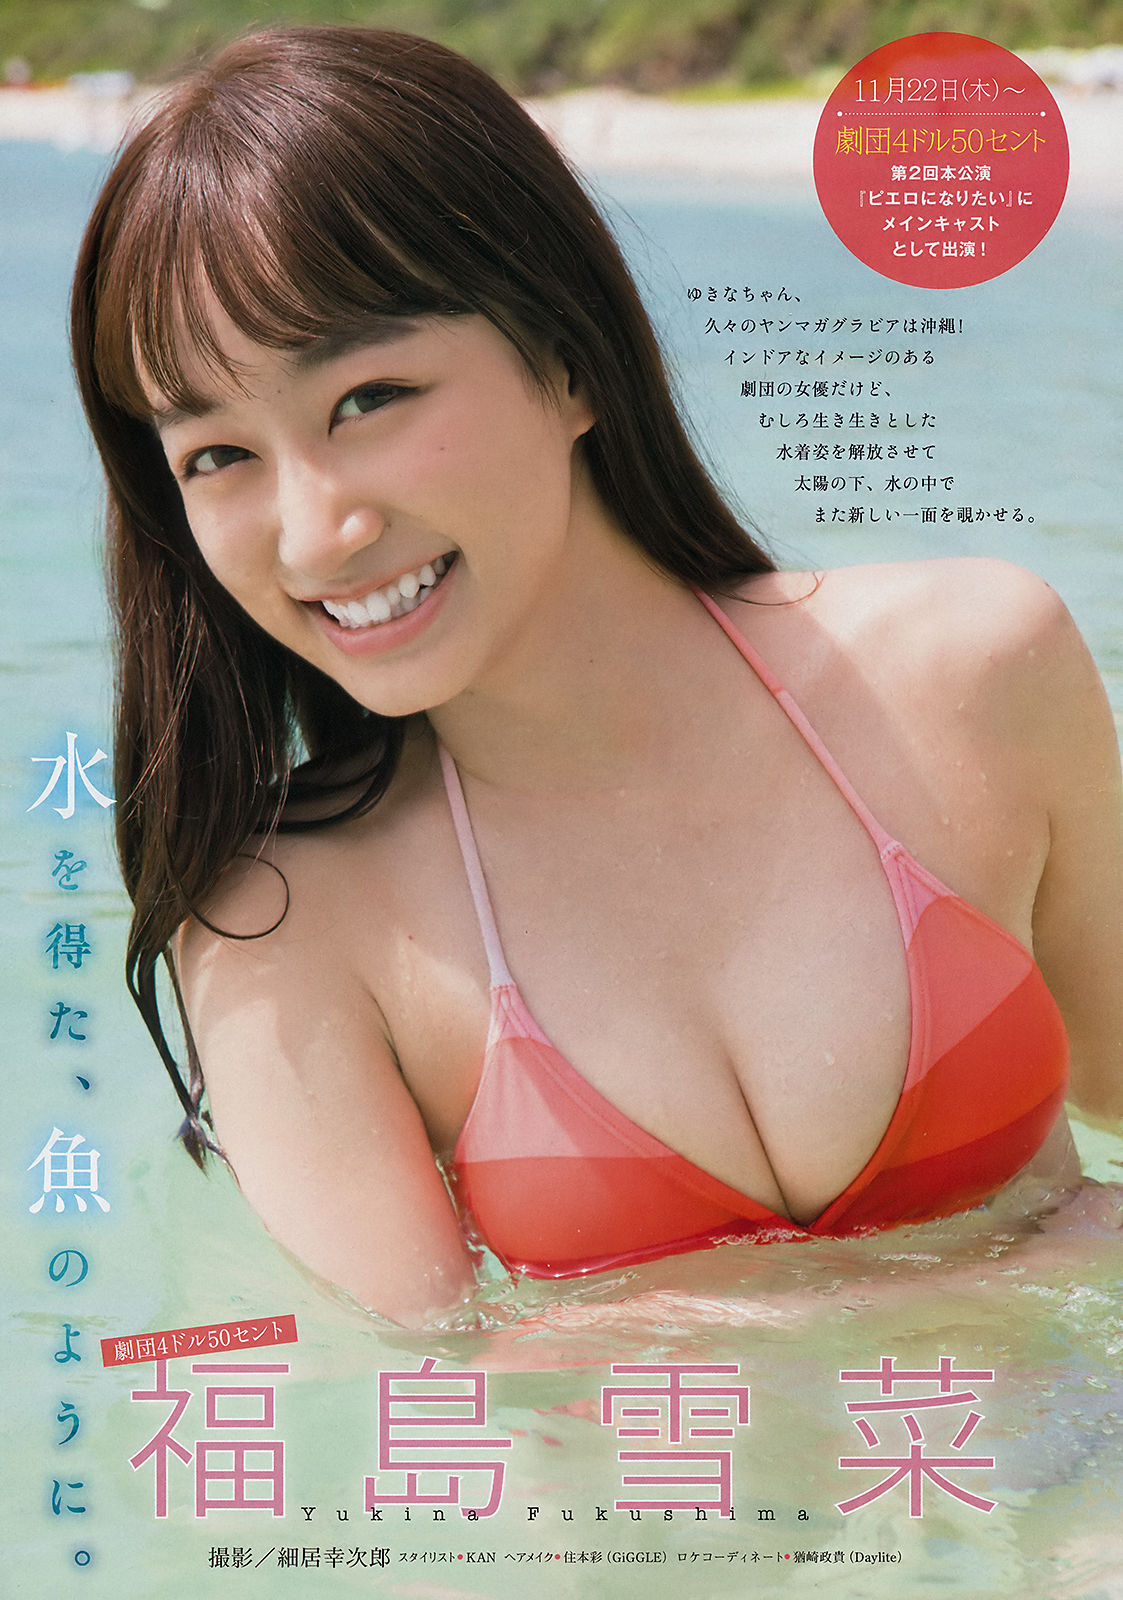 VOL.66 [Young Magazine]美胸美乳:福岛雪菜超高清写真套图(13P)